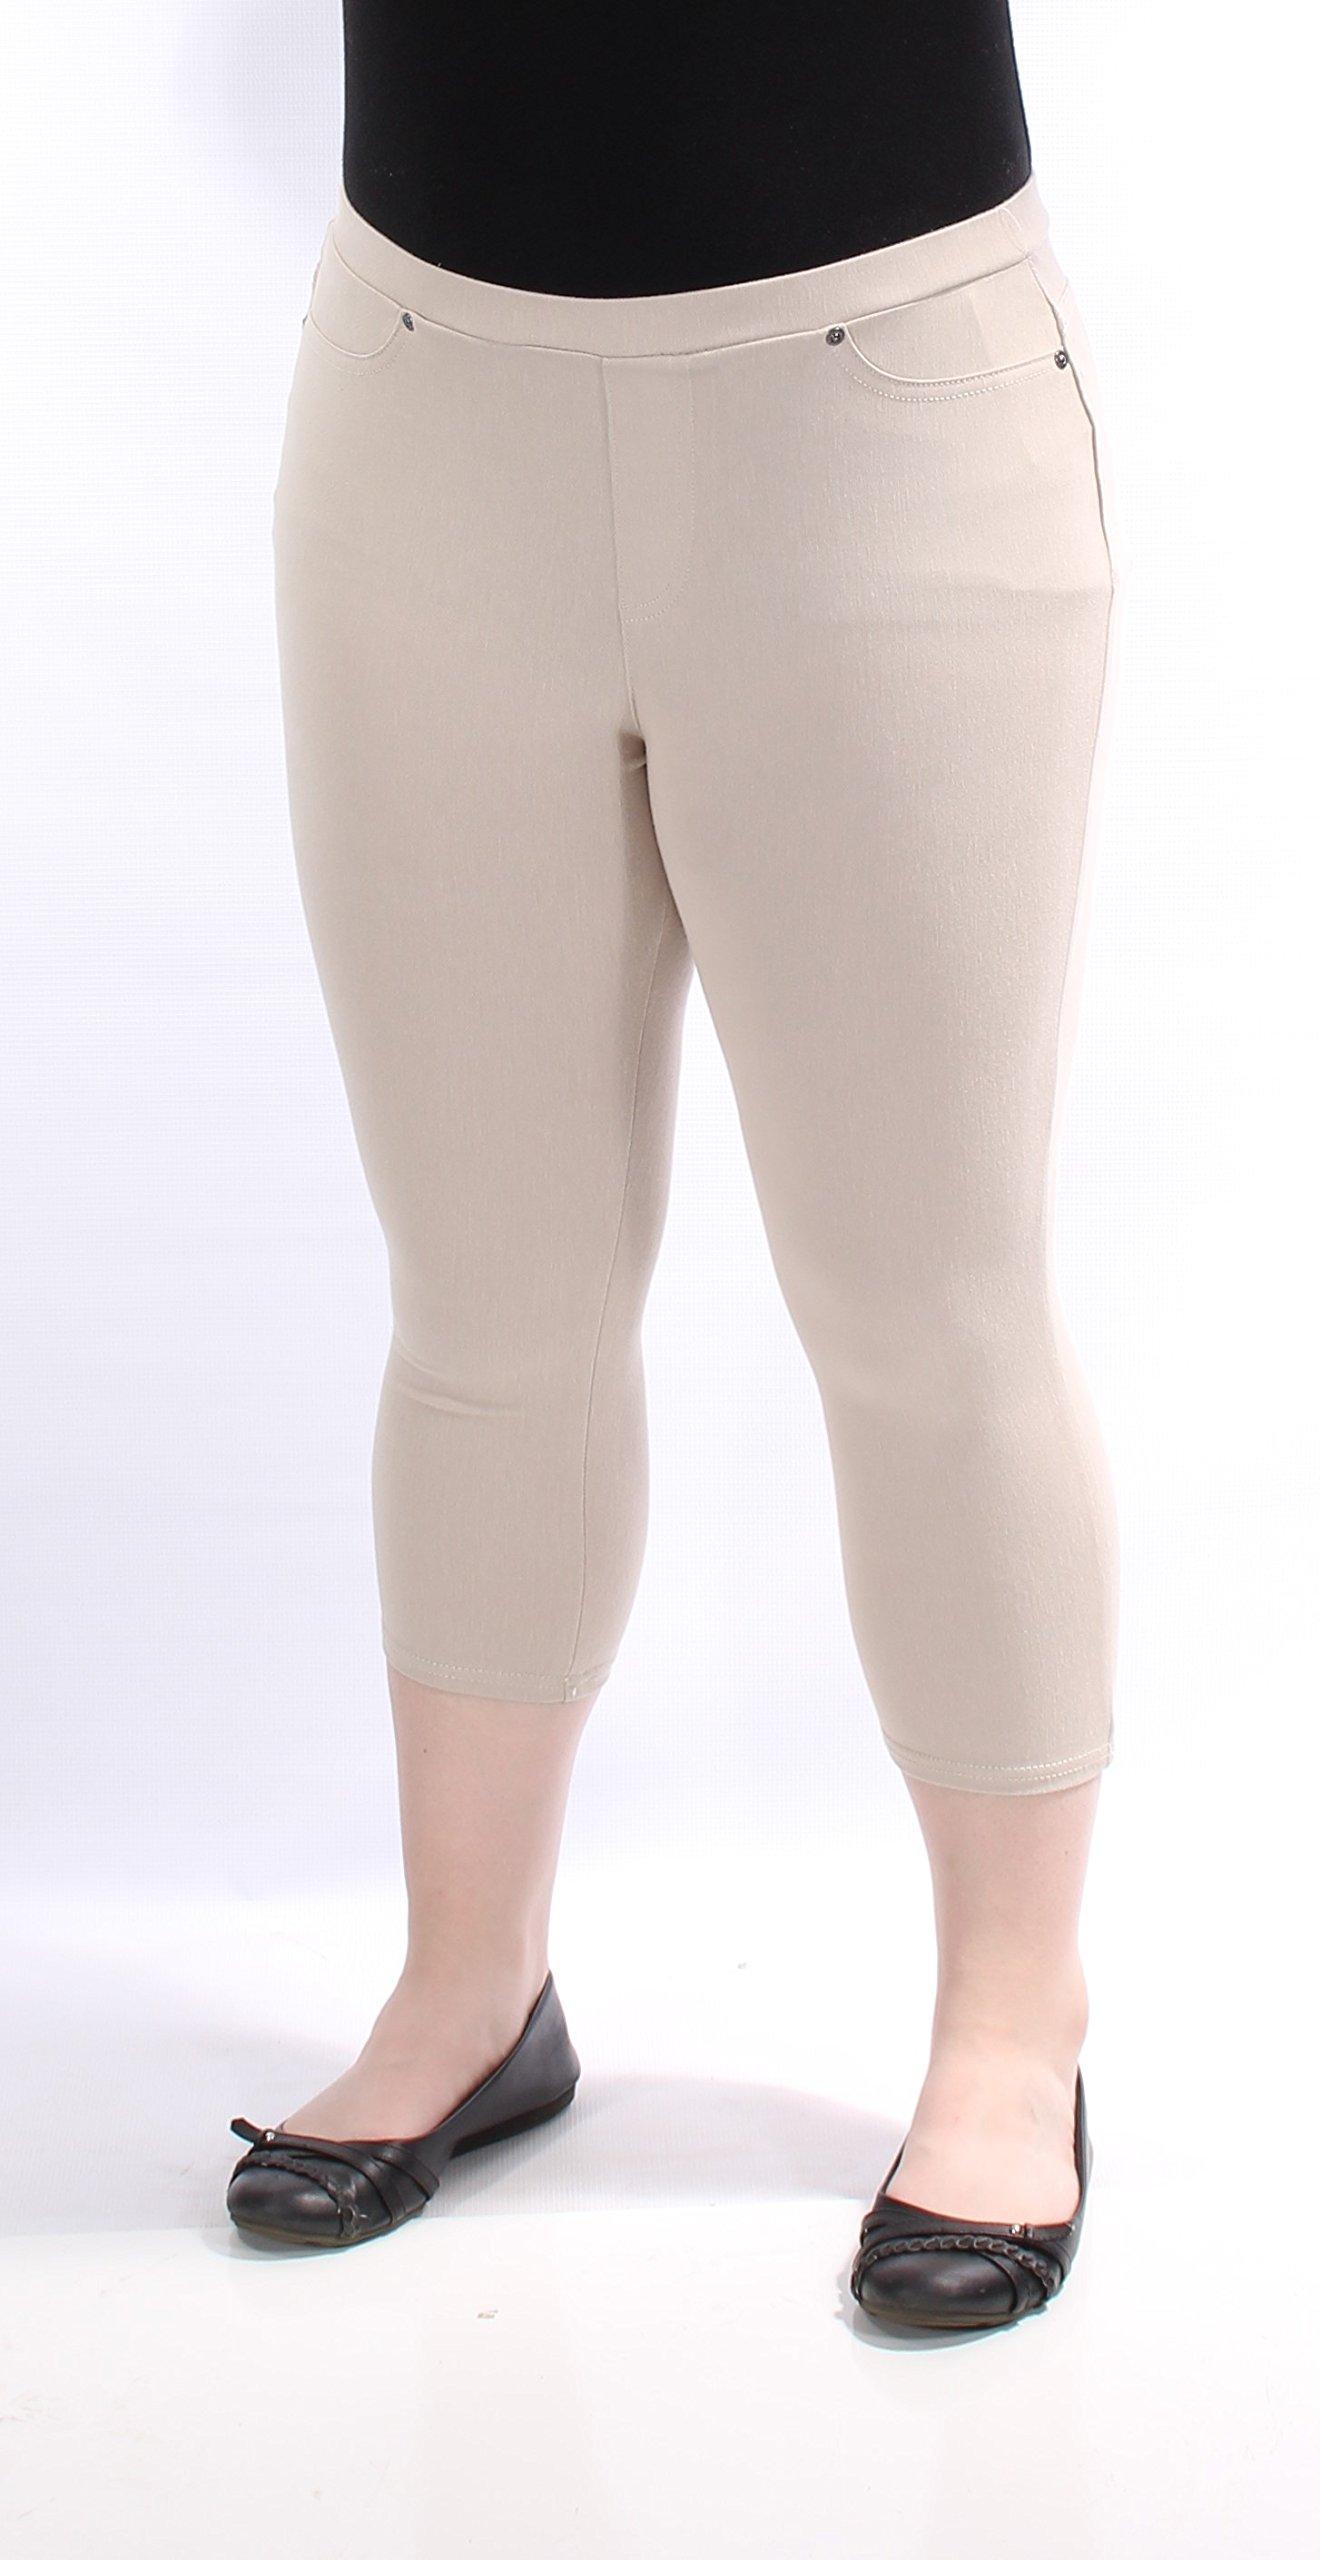 Style & Company Womens New 1253 Beige Casual Leggings Petites XL B+B